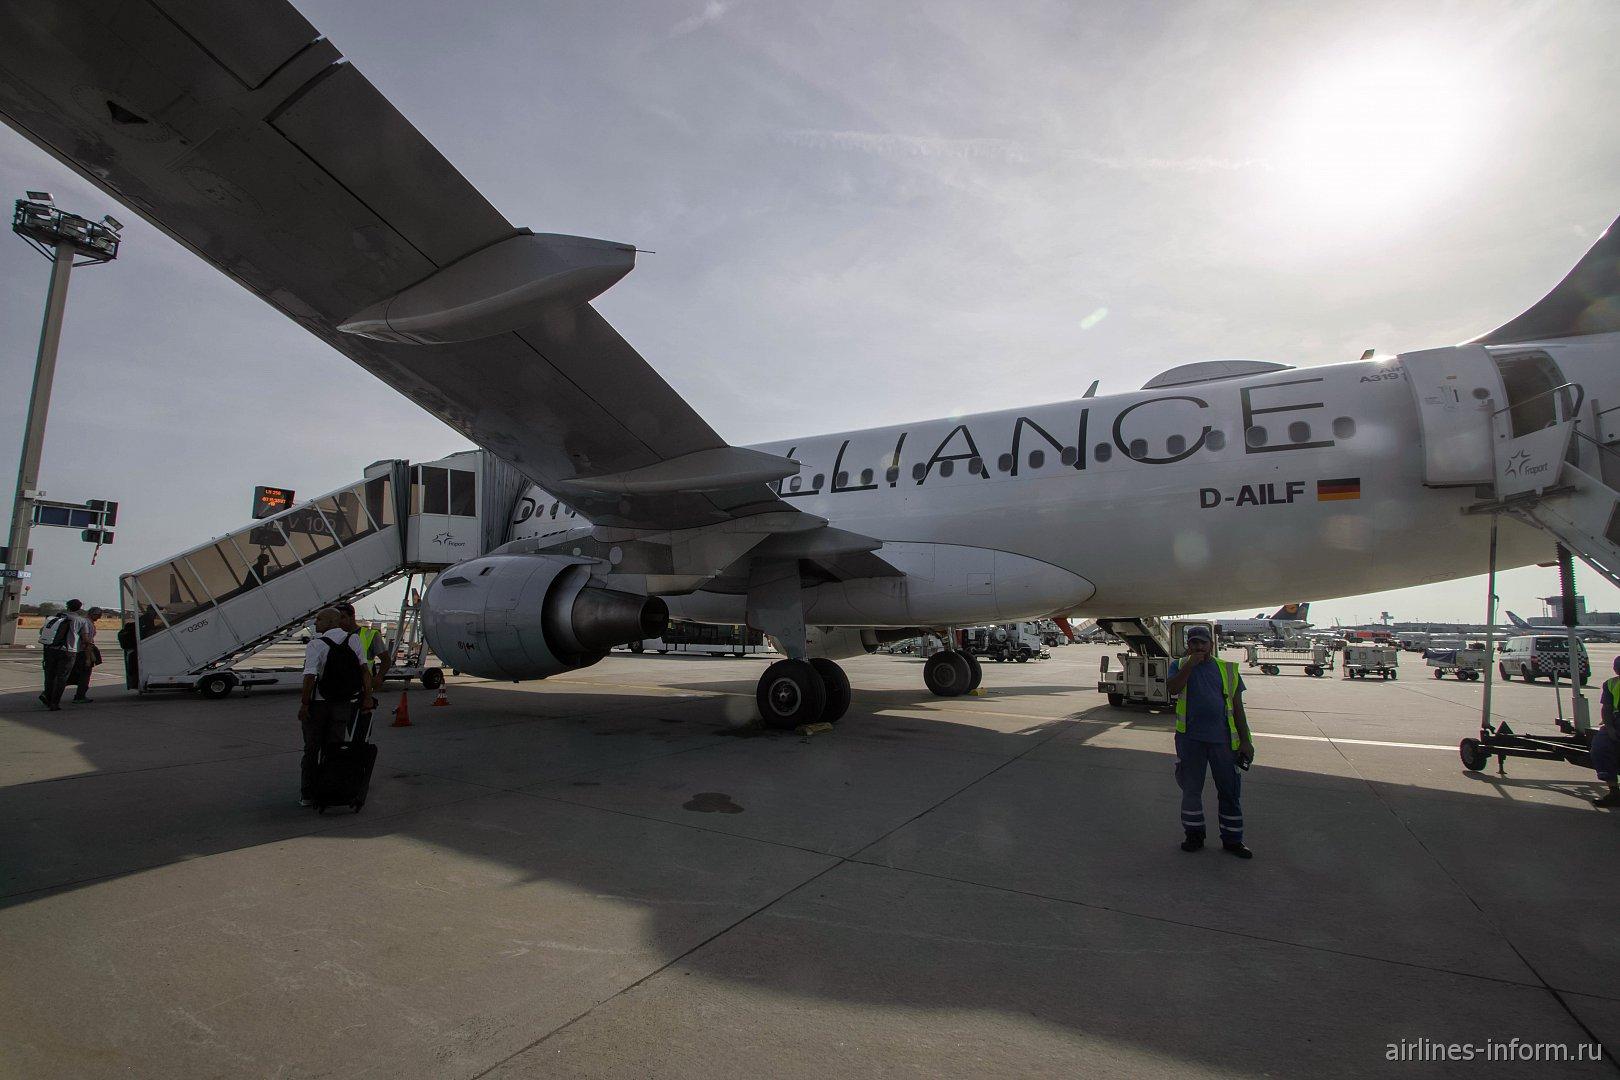 Nonstop you. Франкфурт - Милан (Мальпенса) LH256 на A319 Lufthansa в ливрее Star Alliance